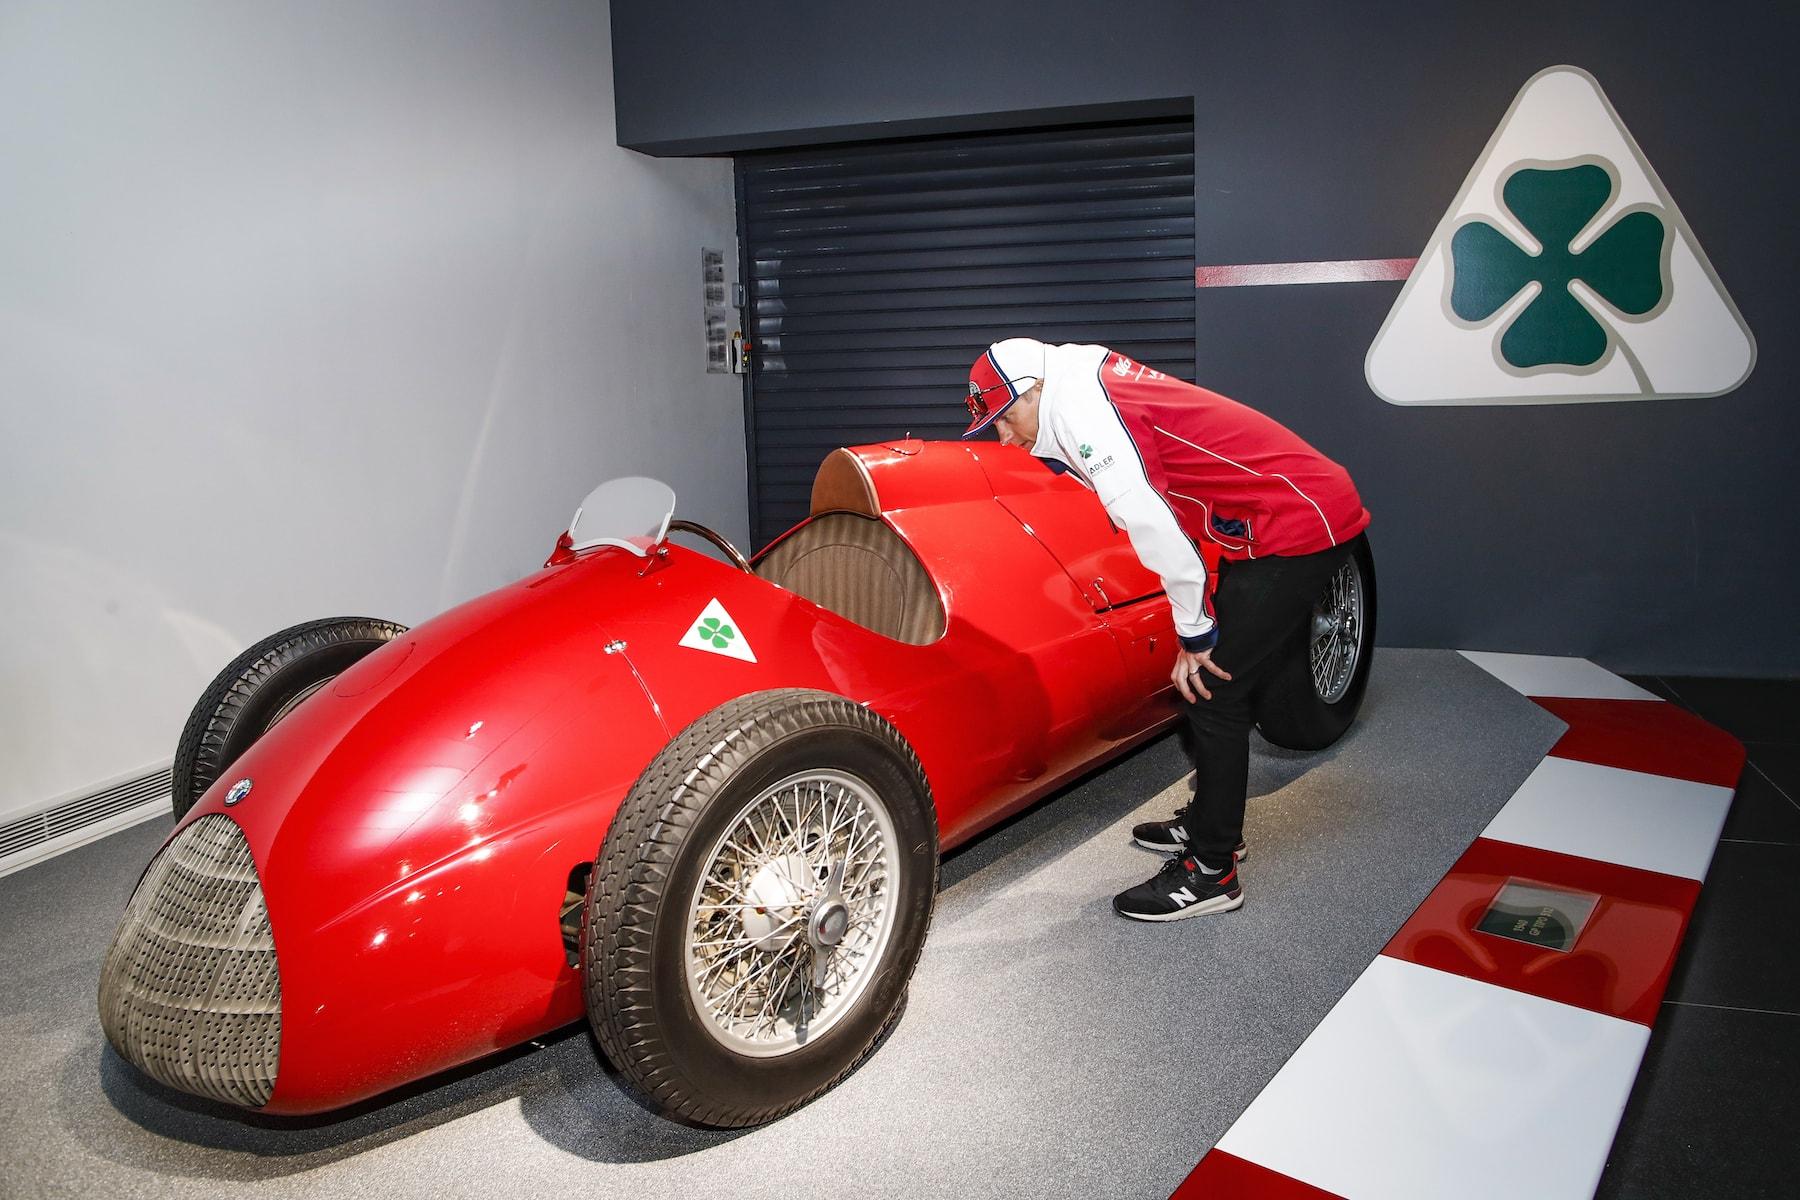 2019 Alfa Romeo at Museo Storico | 2019 Italian GP 13.jpg